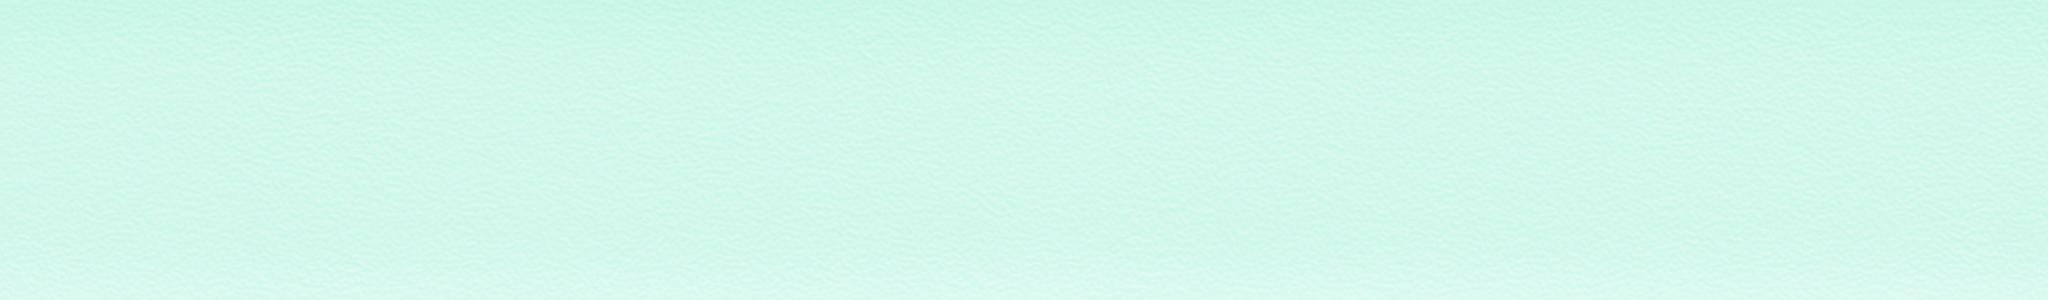 HU 16610 кромка ABS зеленая жемчуг 101